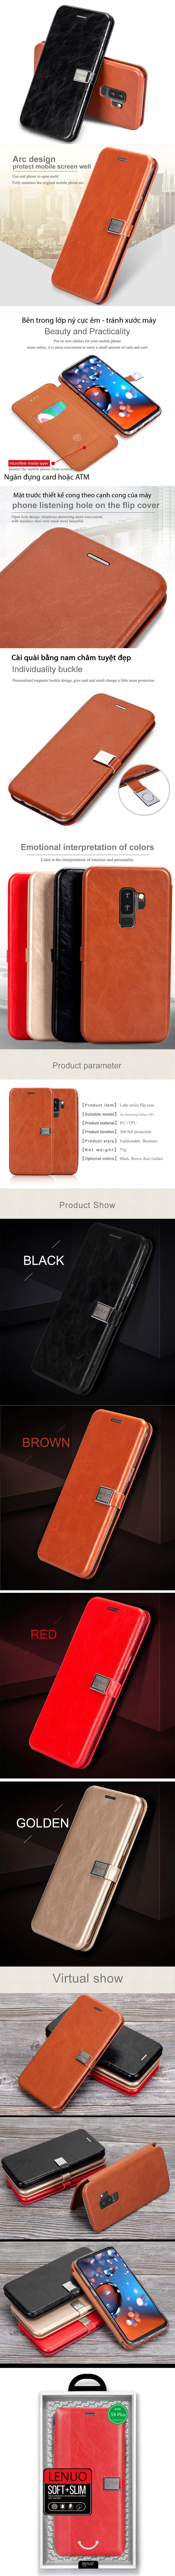 Bao da Galaxy S9 Plus Lenuo Lebe Flip Case độc đáo, đẹp mắt 3